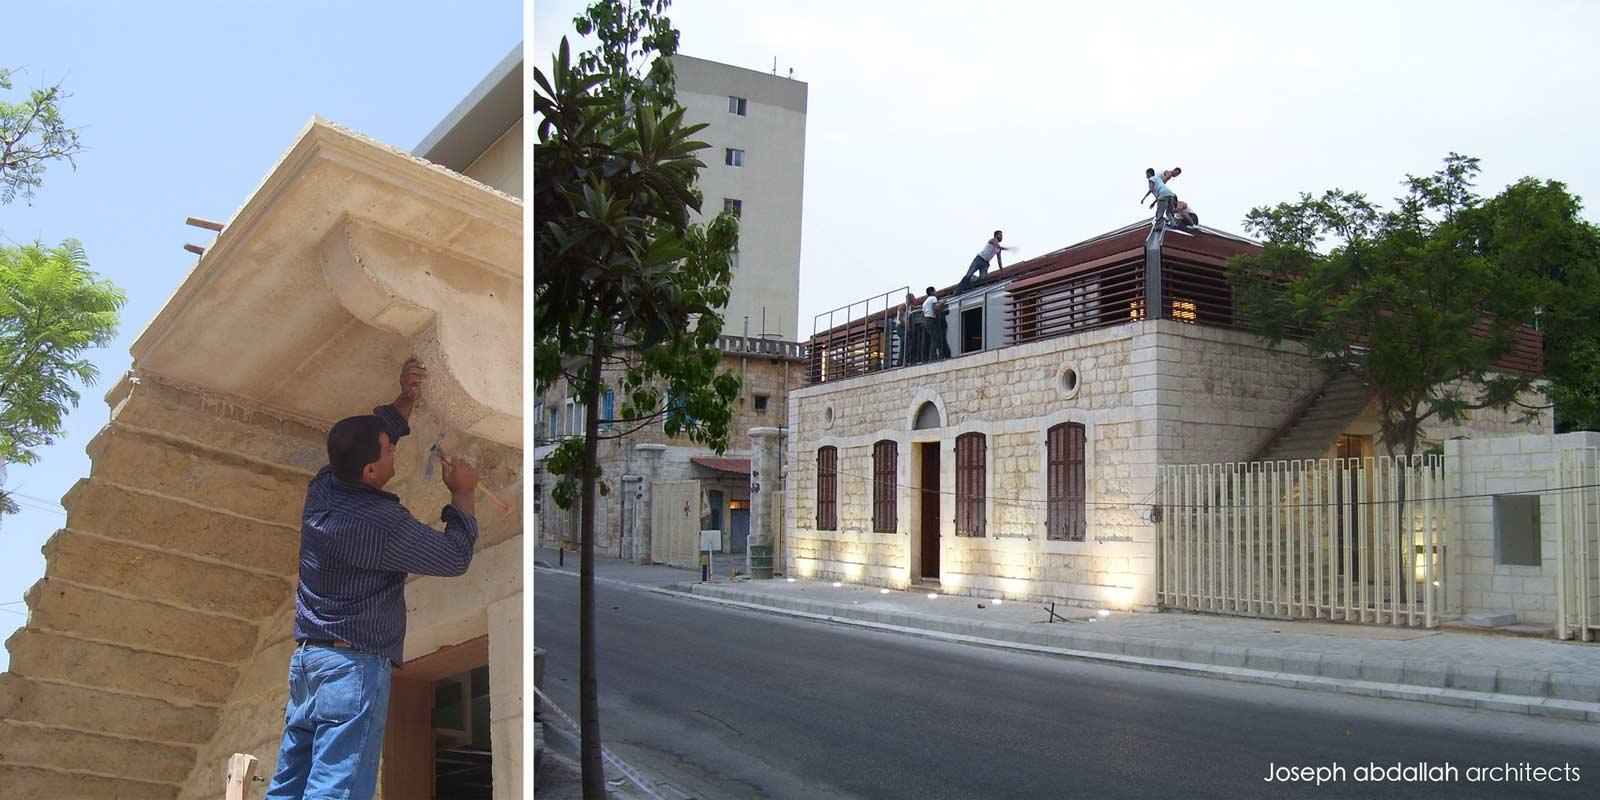 bank-lcb-sgbl-apotres-restoration-architecture-joseph-abdallah-architects-10